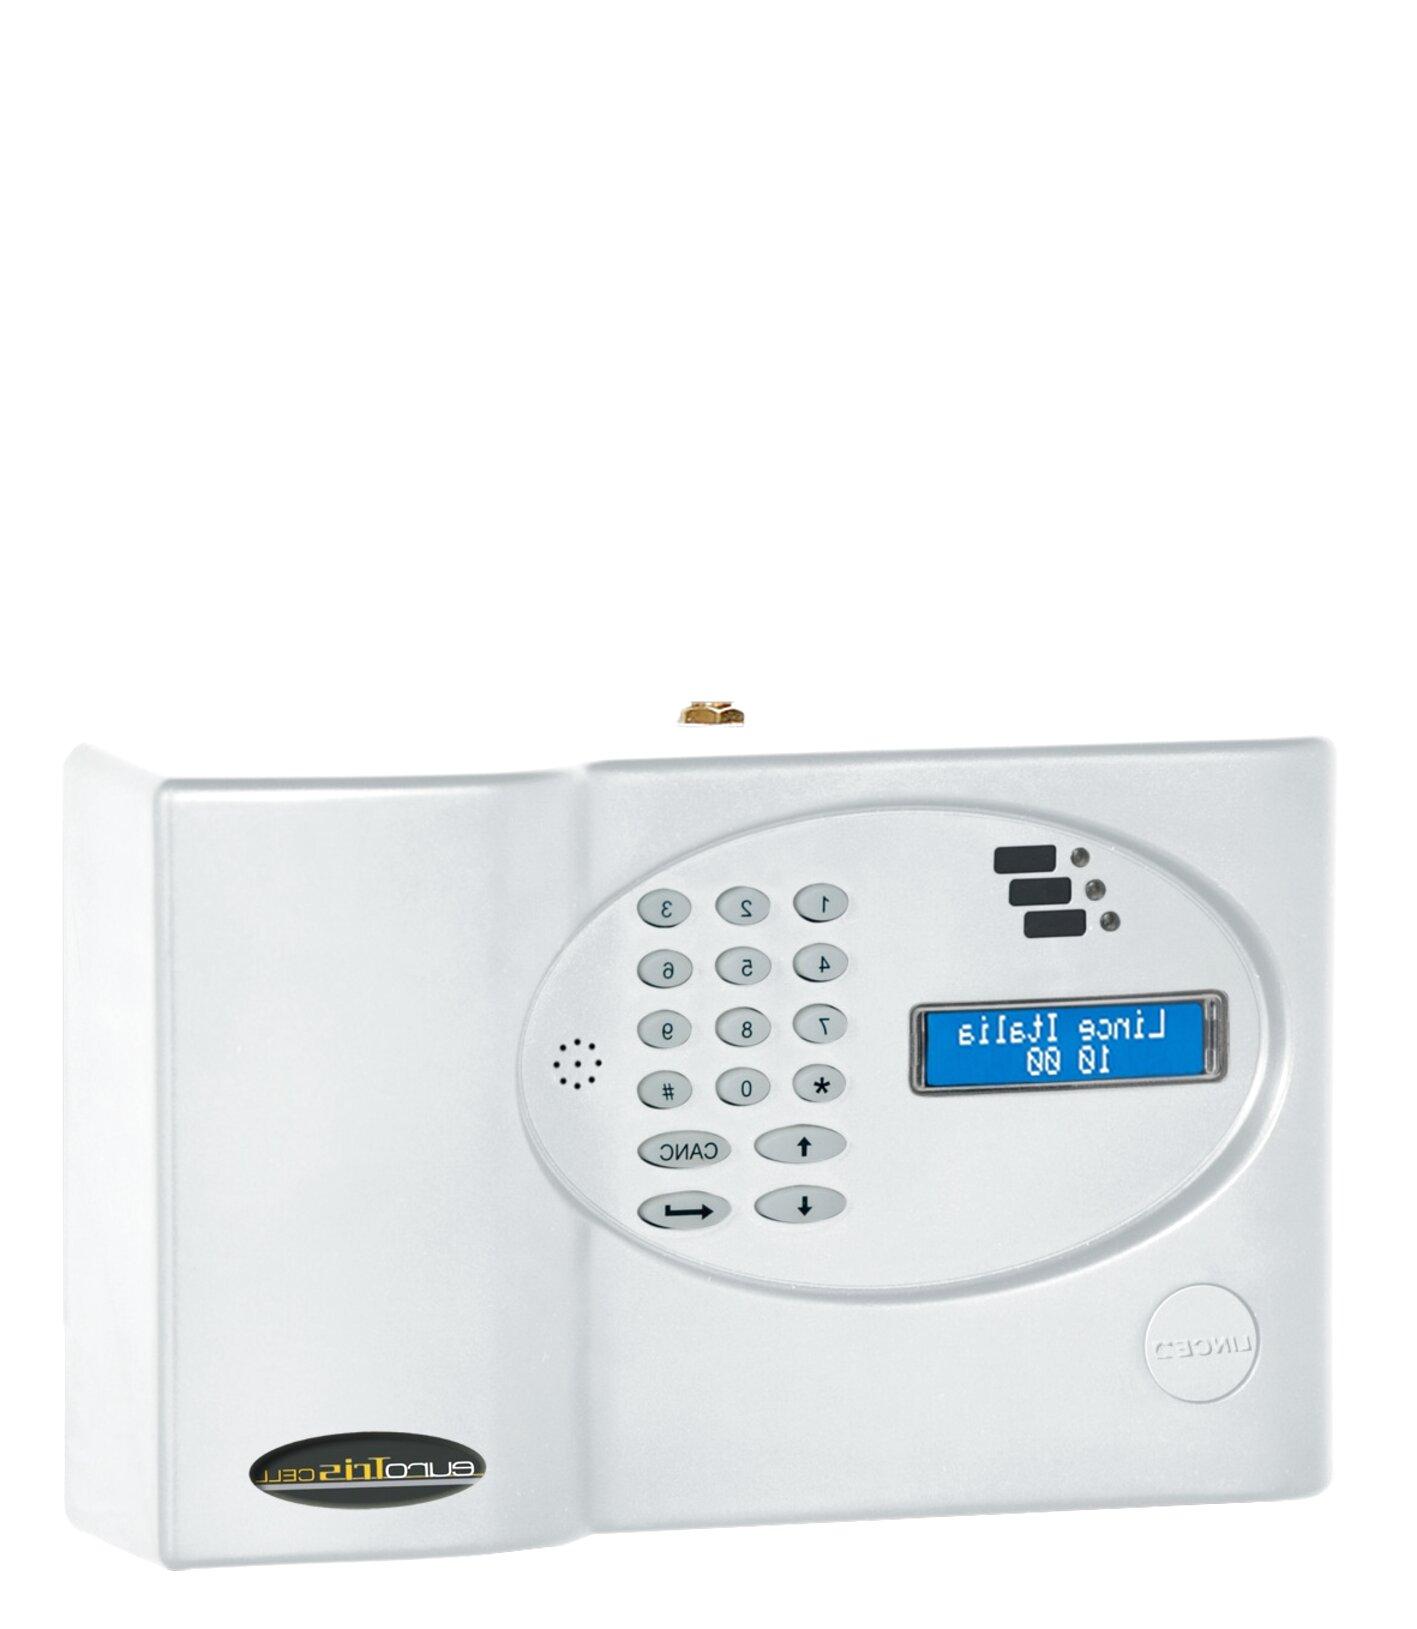 LINCE SPA 4236-EUROTRIS-GSM COMBINATORE TELEFONICO GSM